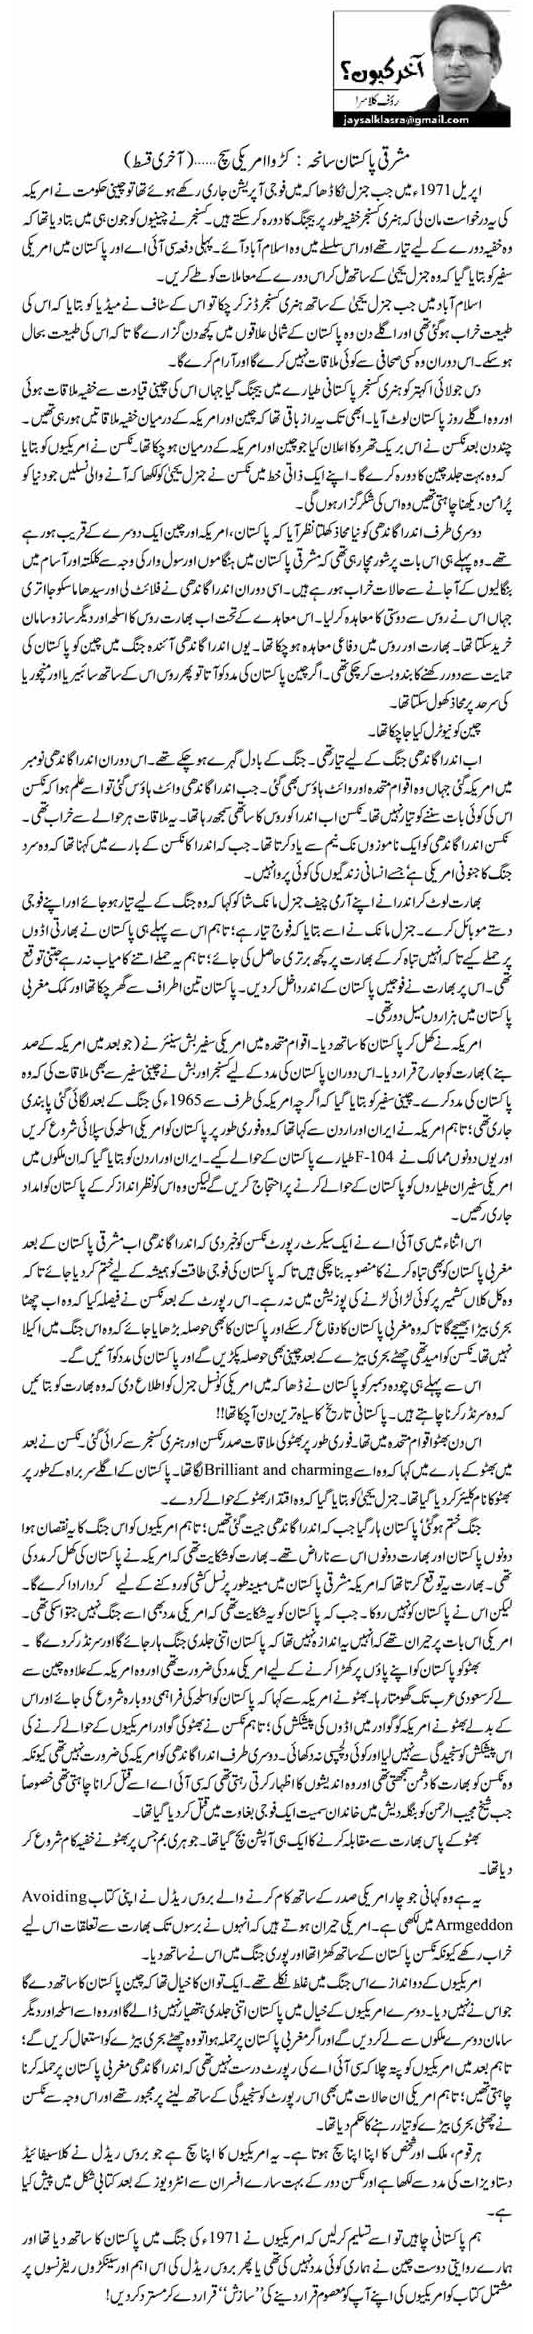 Mashriqi Pakistan -- Karwa Amreki Such -- Last Episod Pakfunny.com